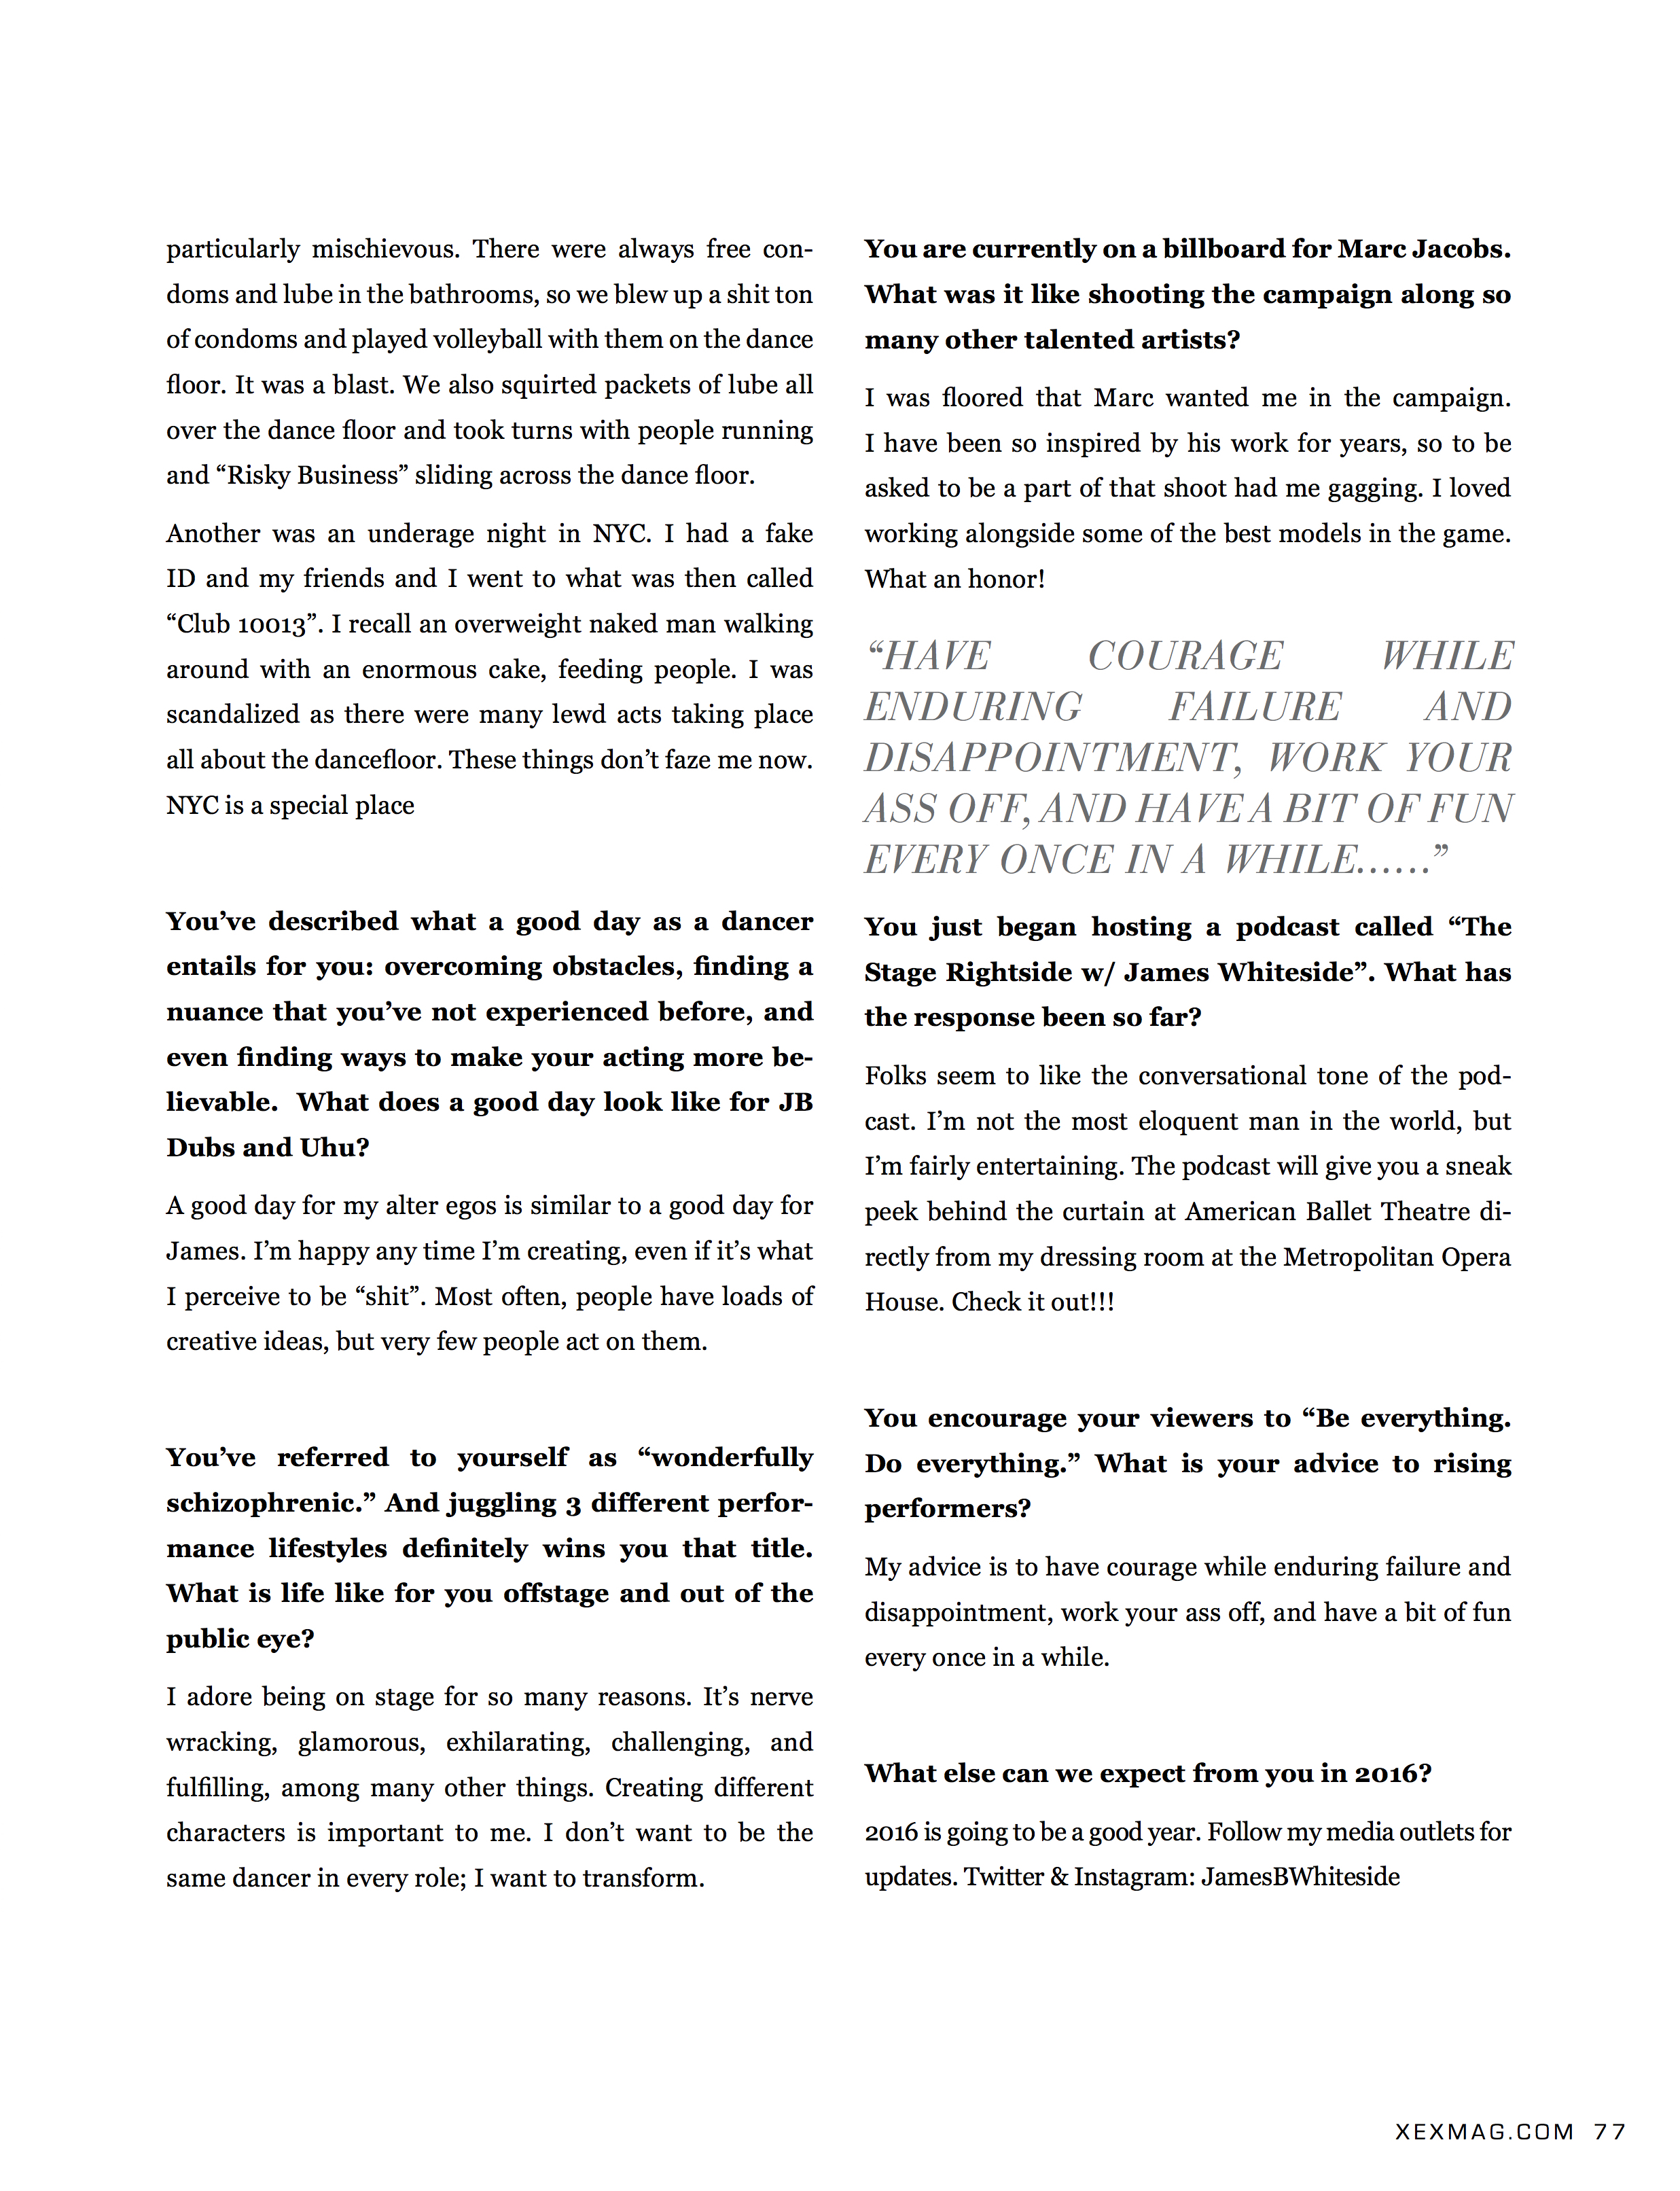 XEX Magazine FLUXEdition_James1 7.jpg